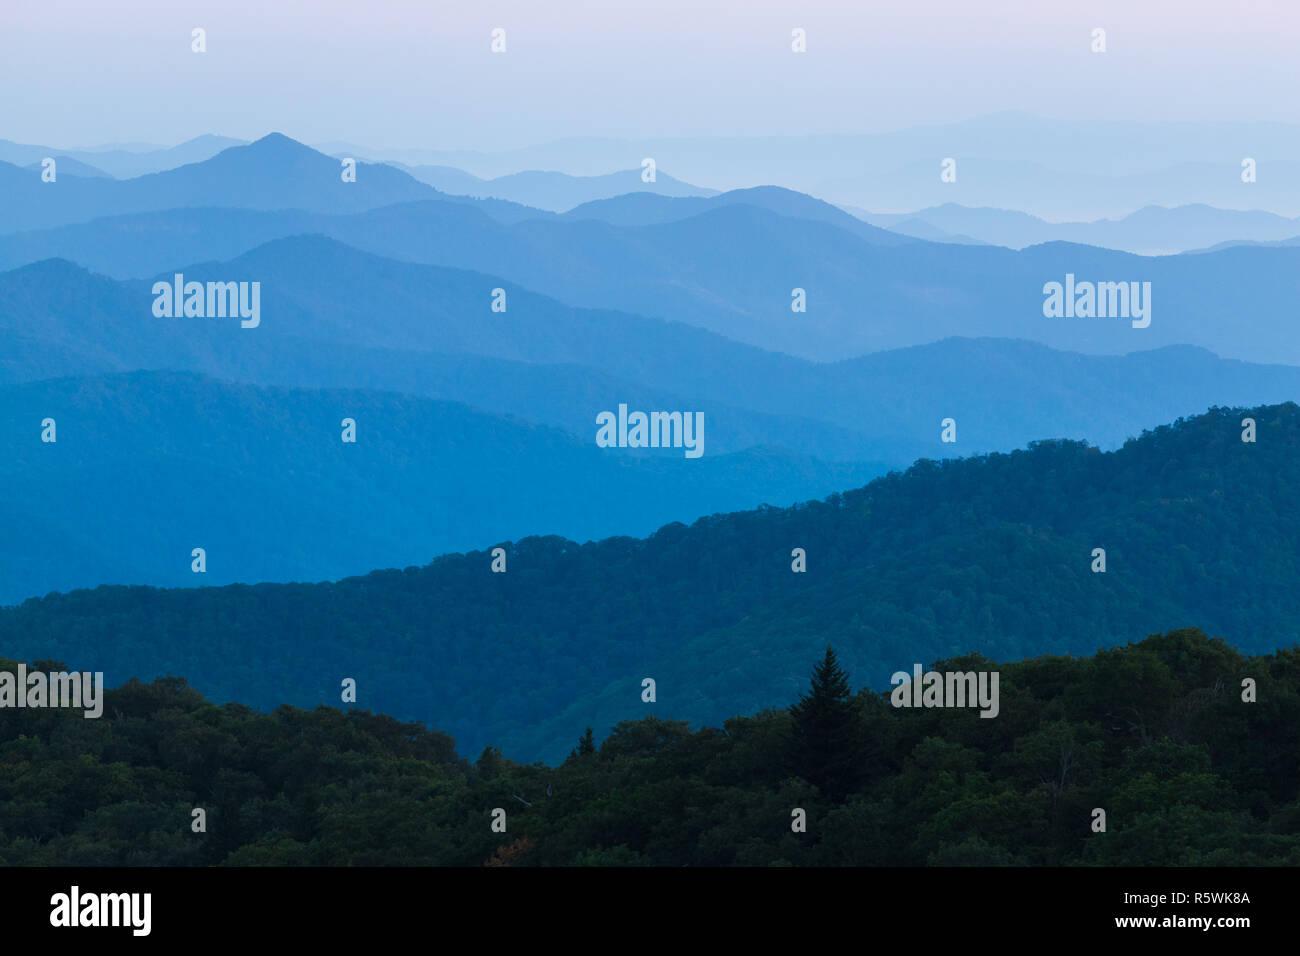 The beautiful smoky mountains from Asheville, North Carolina - Stock Image